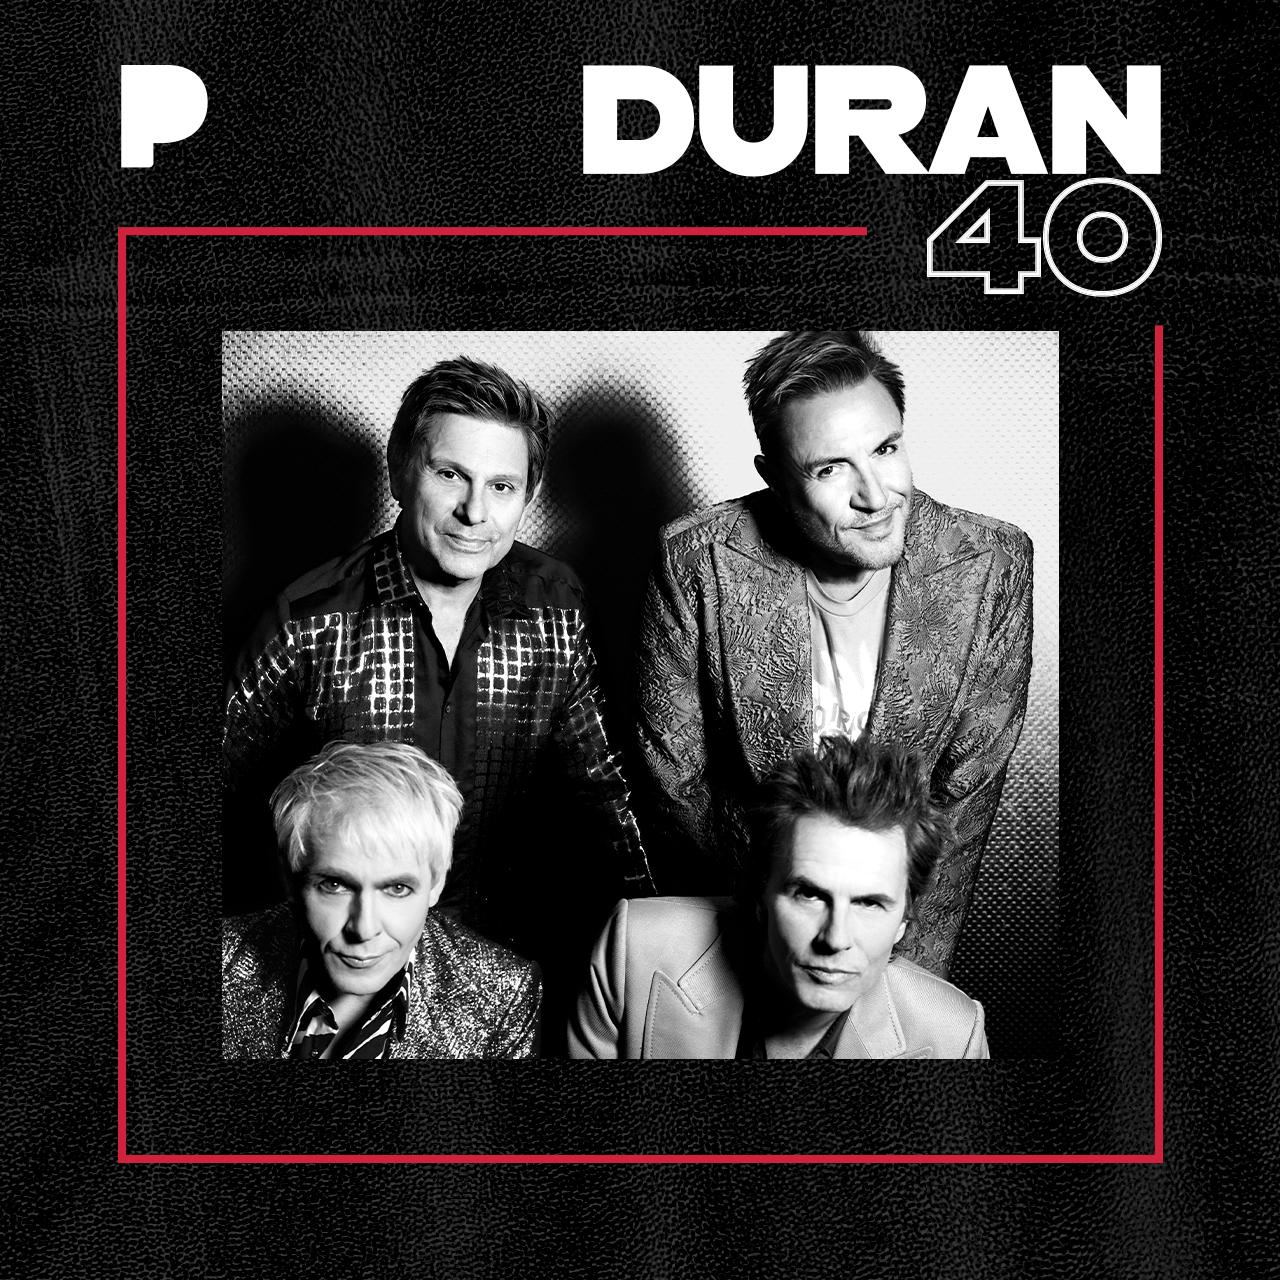 Duran40 V11 Leather